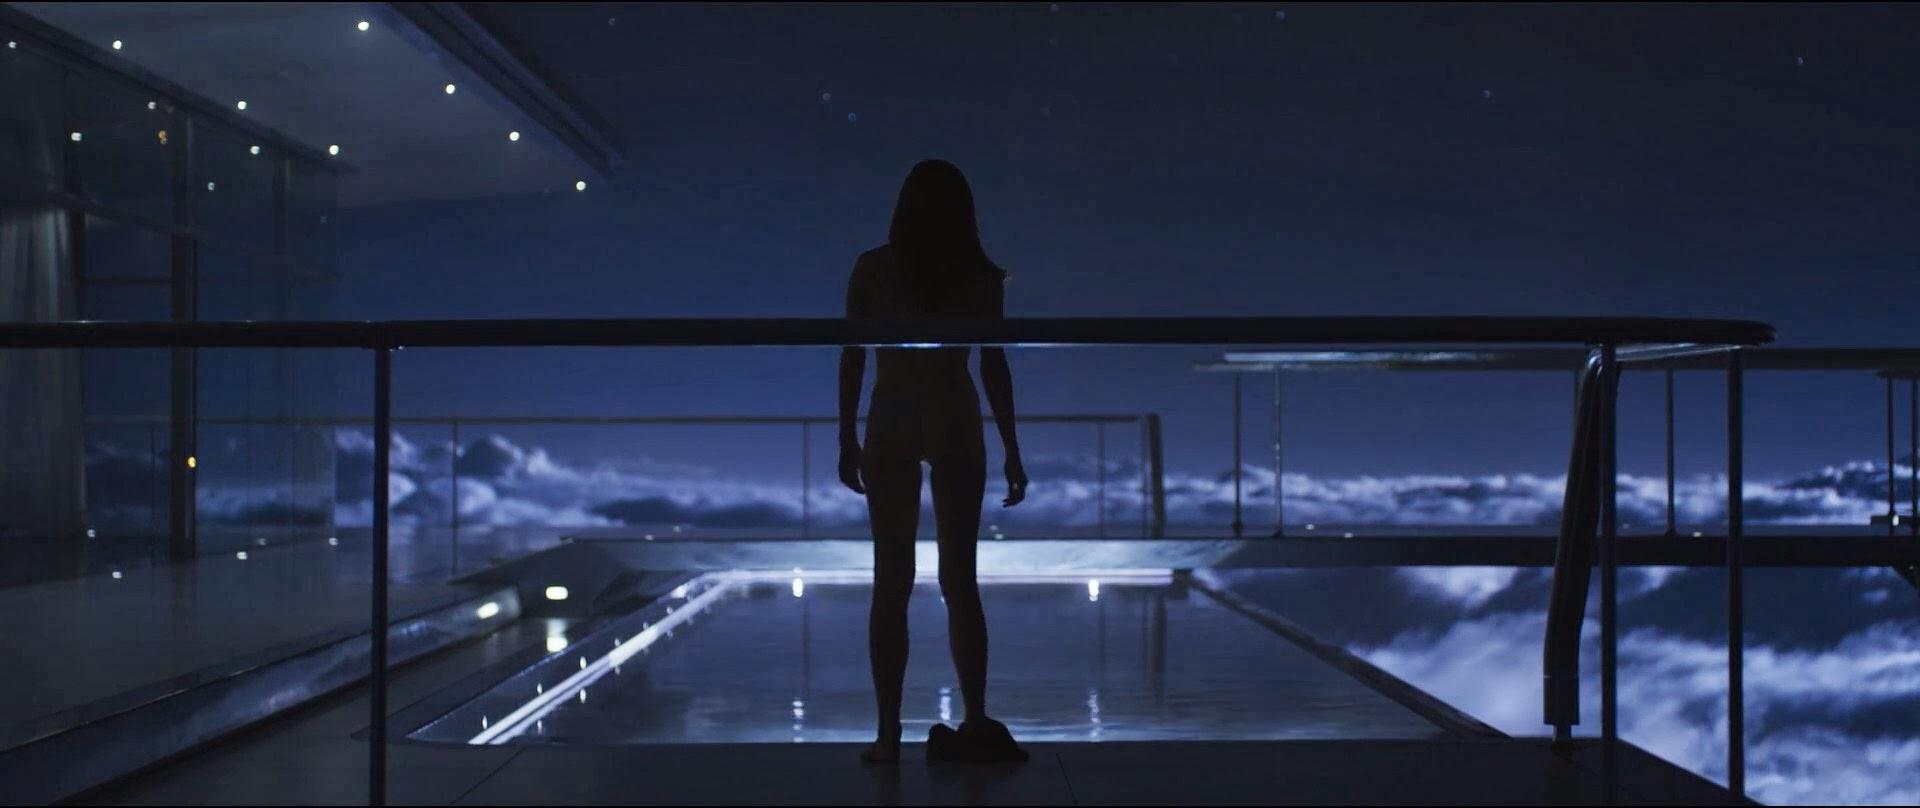 Oblivion (2013) BluRay 1080p 5.1CH x264 Ganool_0009